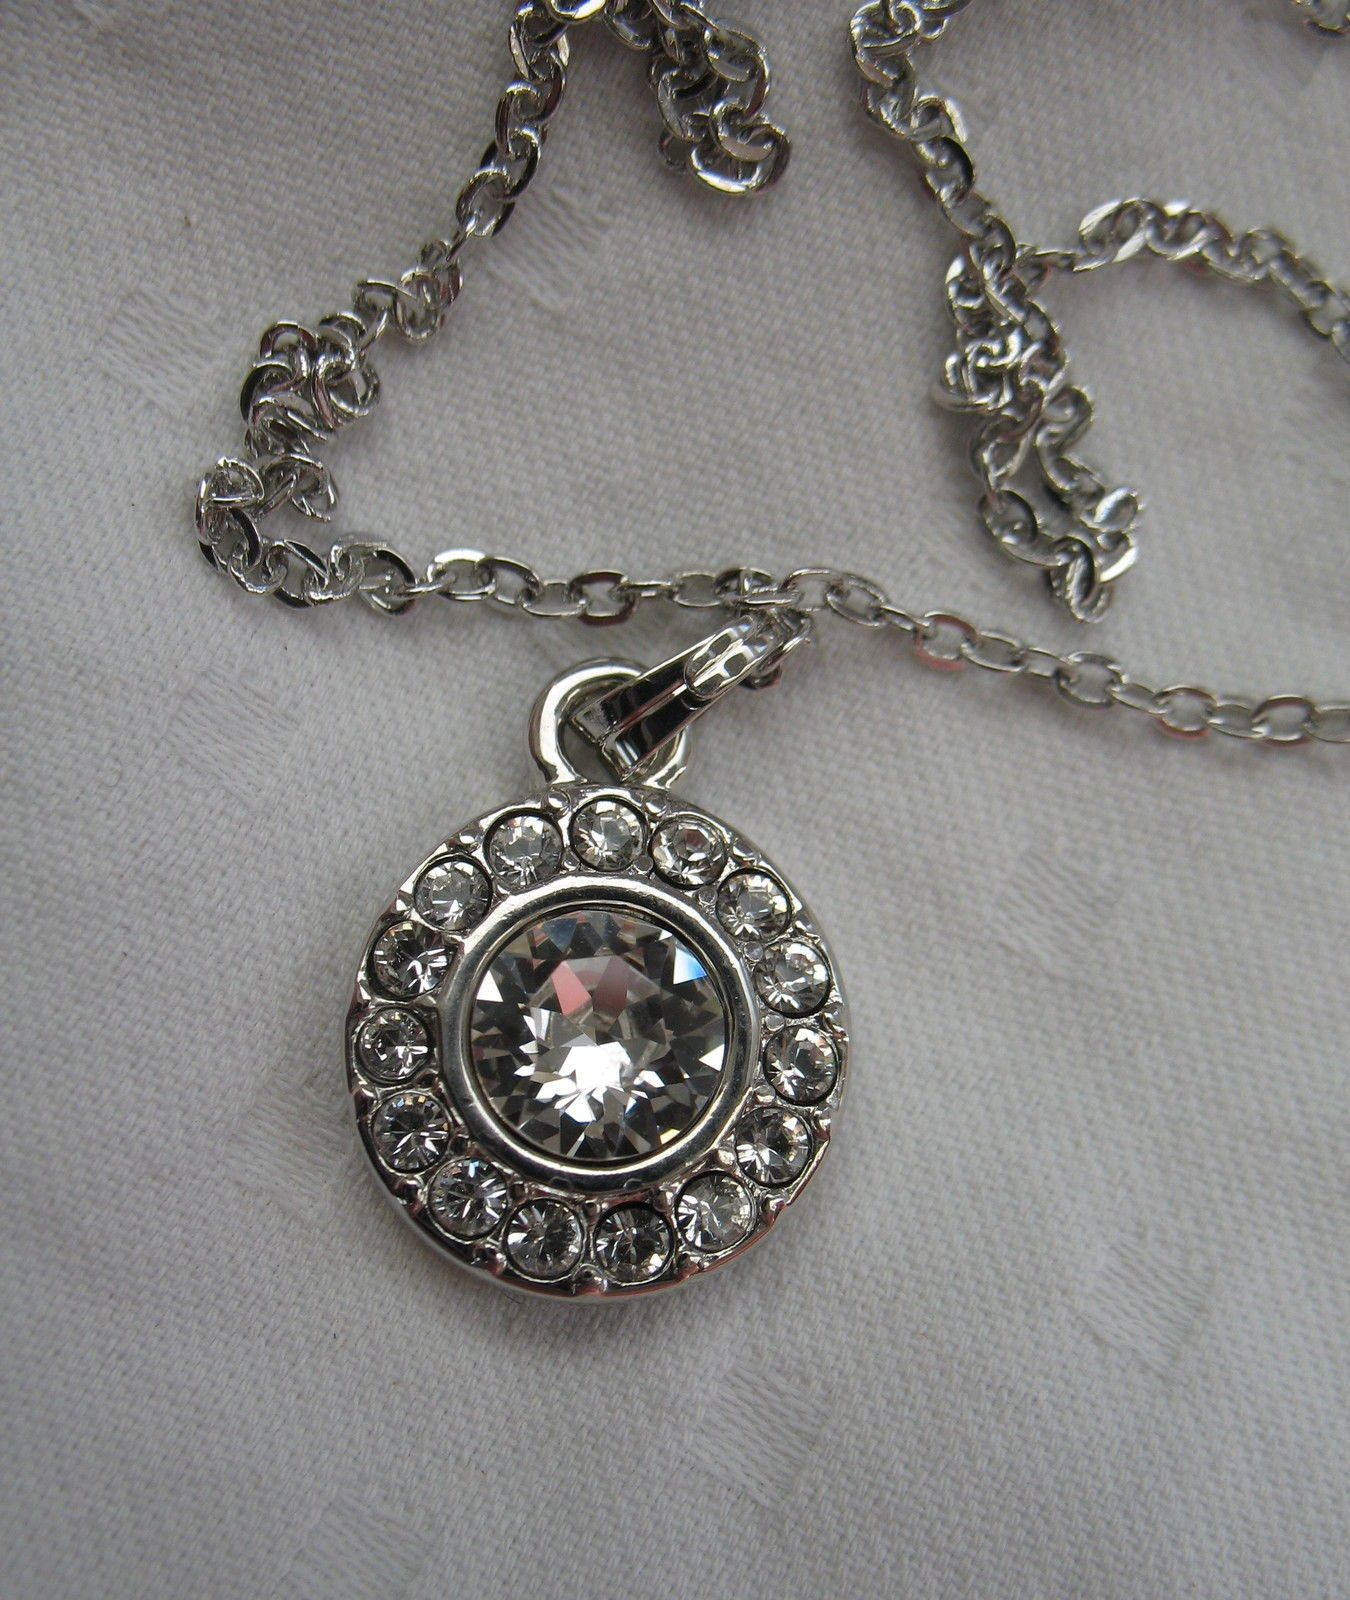 Mestige New Crystal Mandala Set Earrings Necklace Swarovski Elements Jewelry image 7